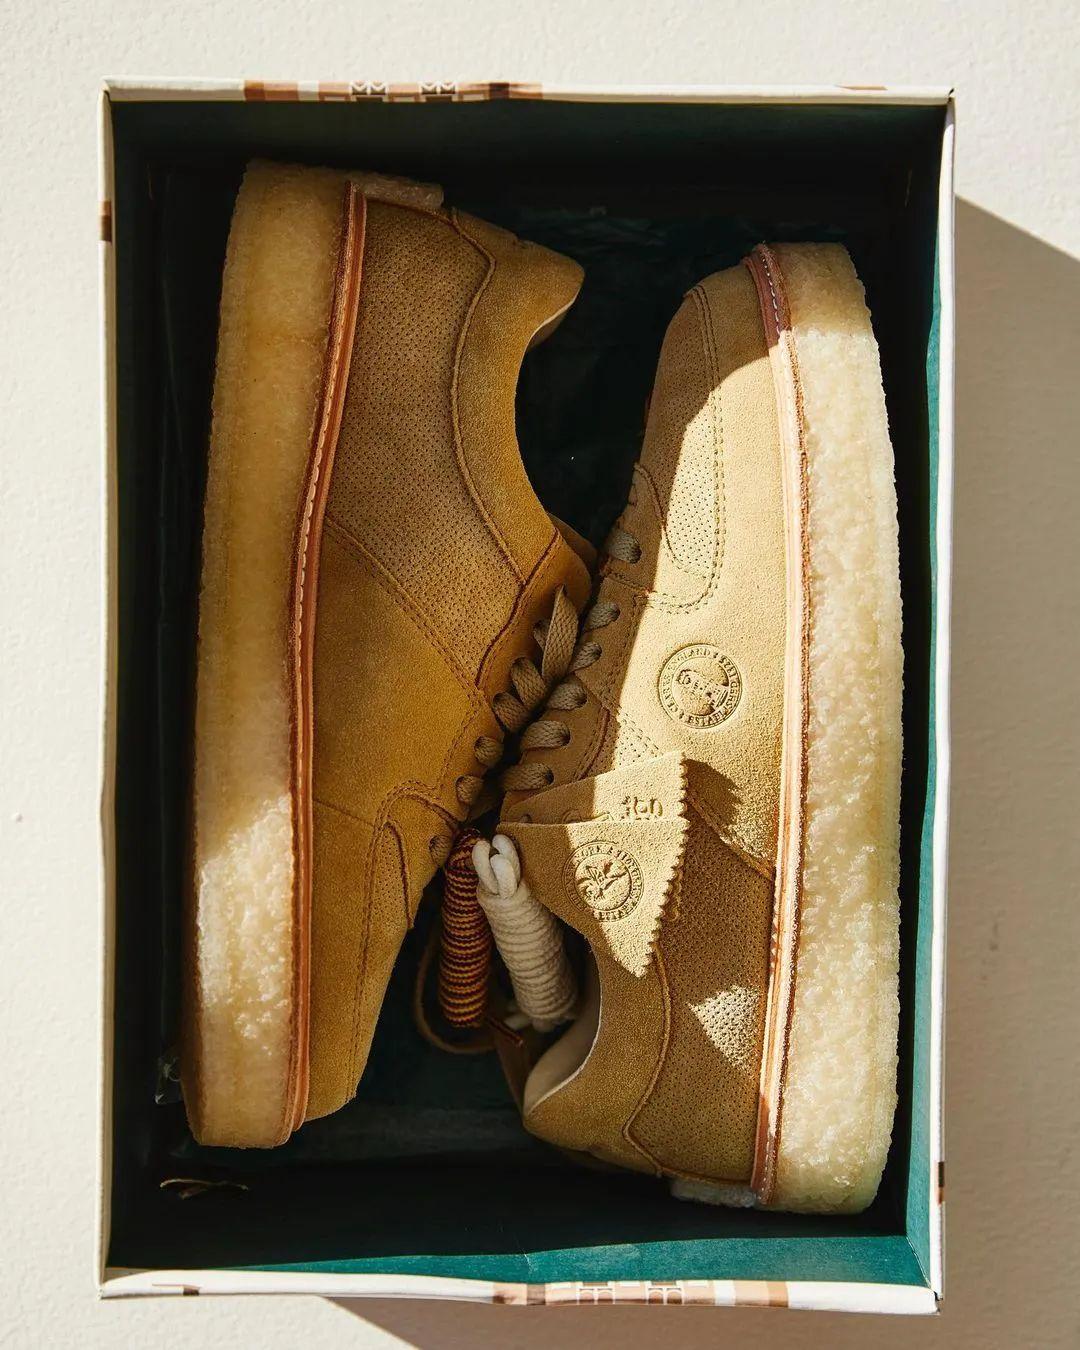 Kith x 李宁?主理人狂晒Clarks新联名鞋款,确认限量发售!